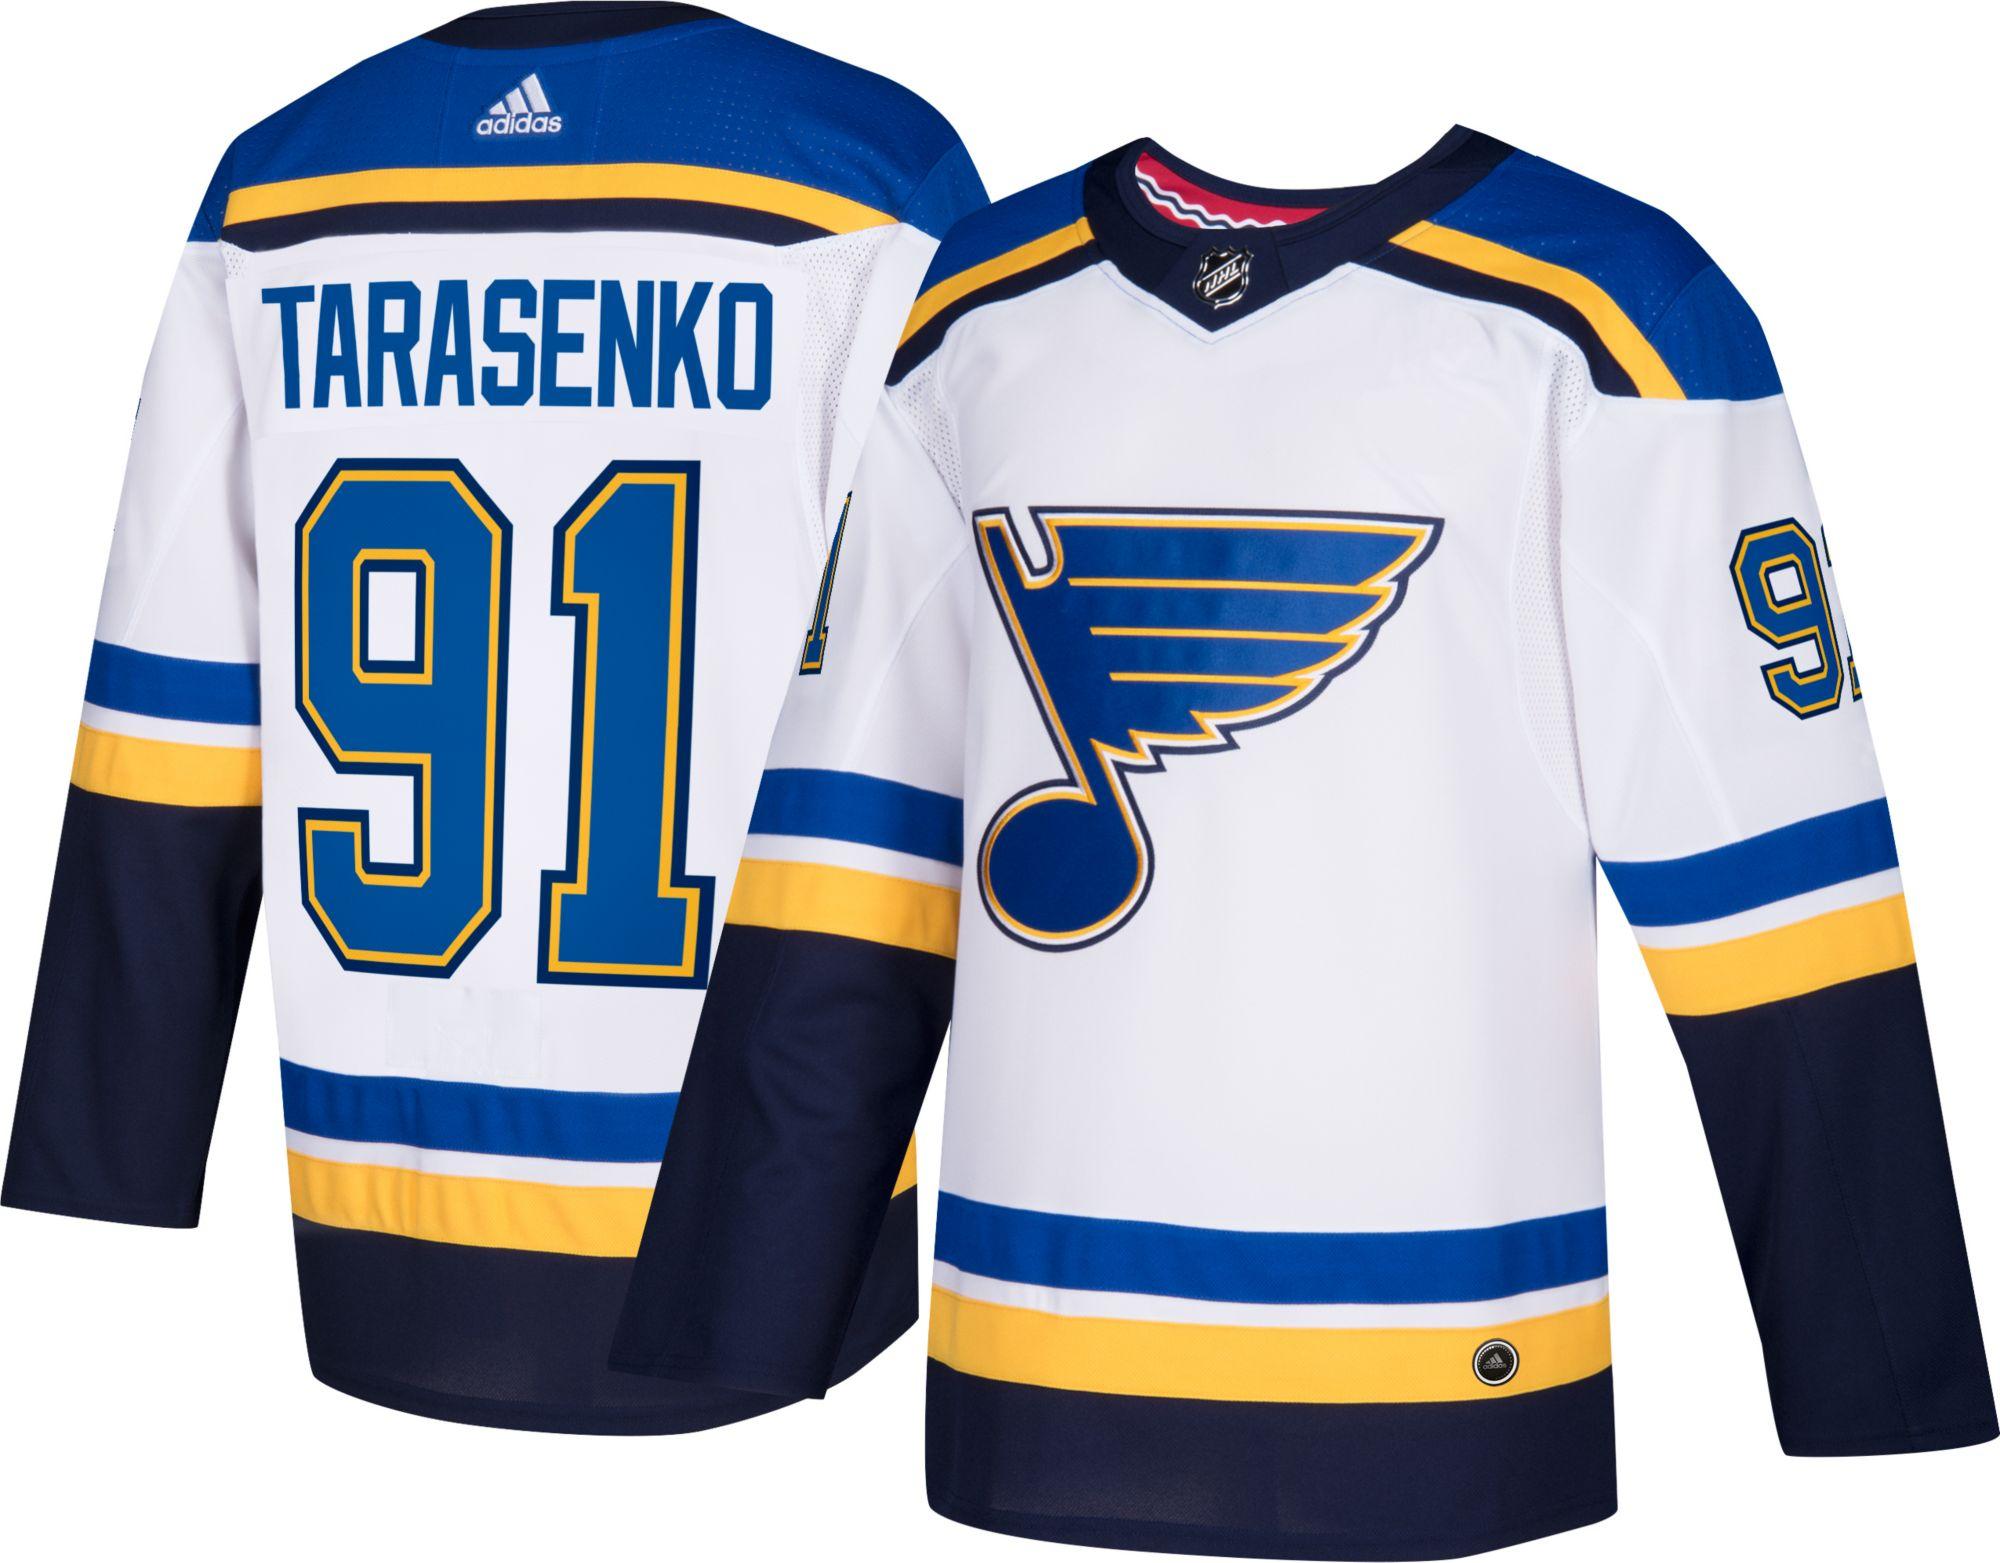 tarasenko away jersey